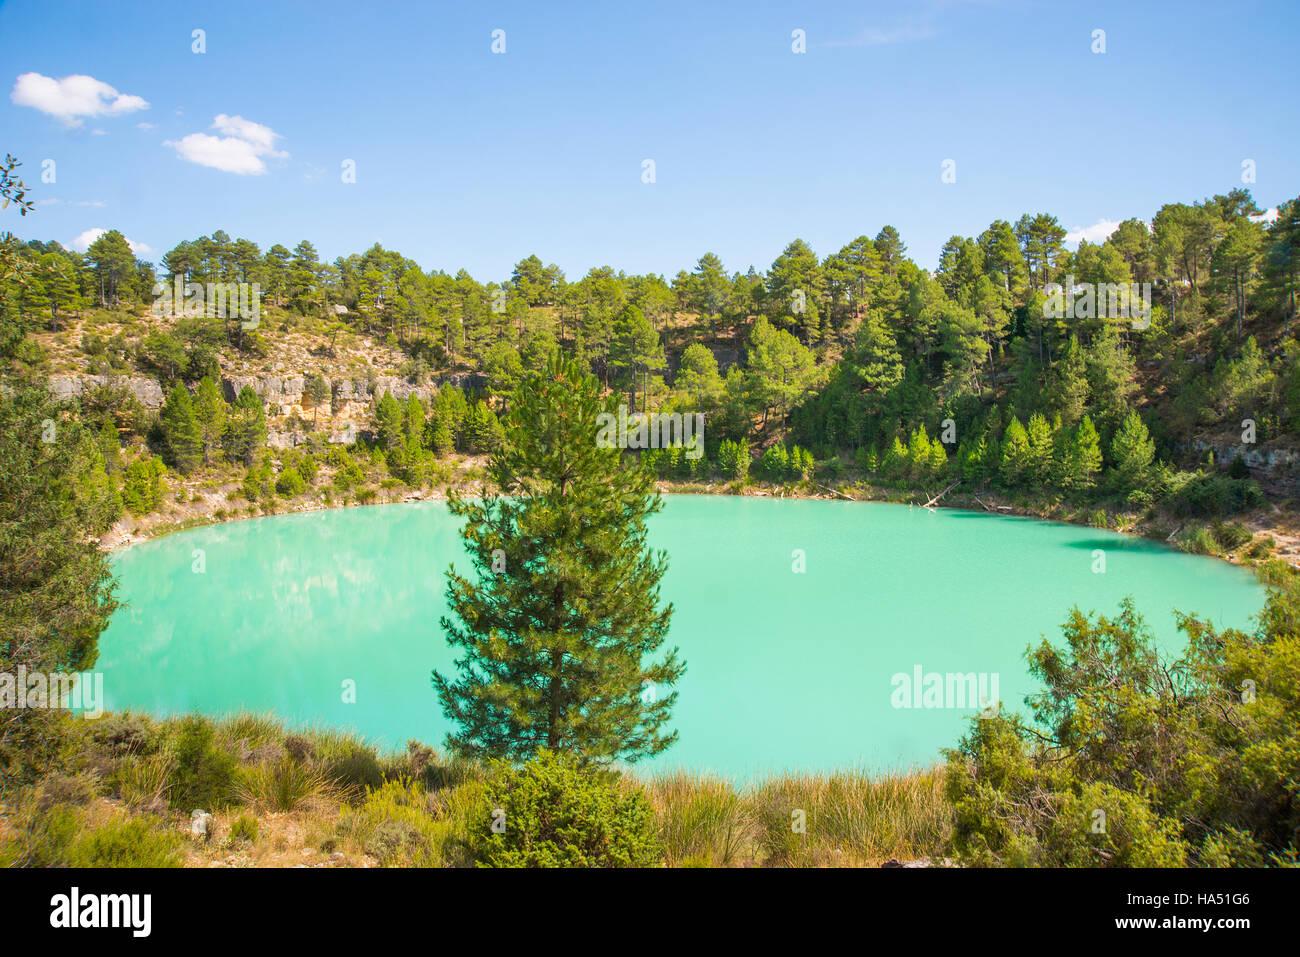 La Gitana lake, natural monument. Lagunas de Cañada del Hoyo, Serrania de Cuenca Nature Reserve, Cuenca province, - Stock Image